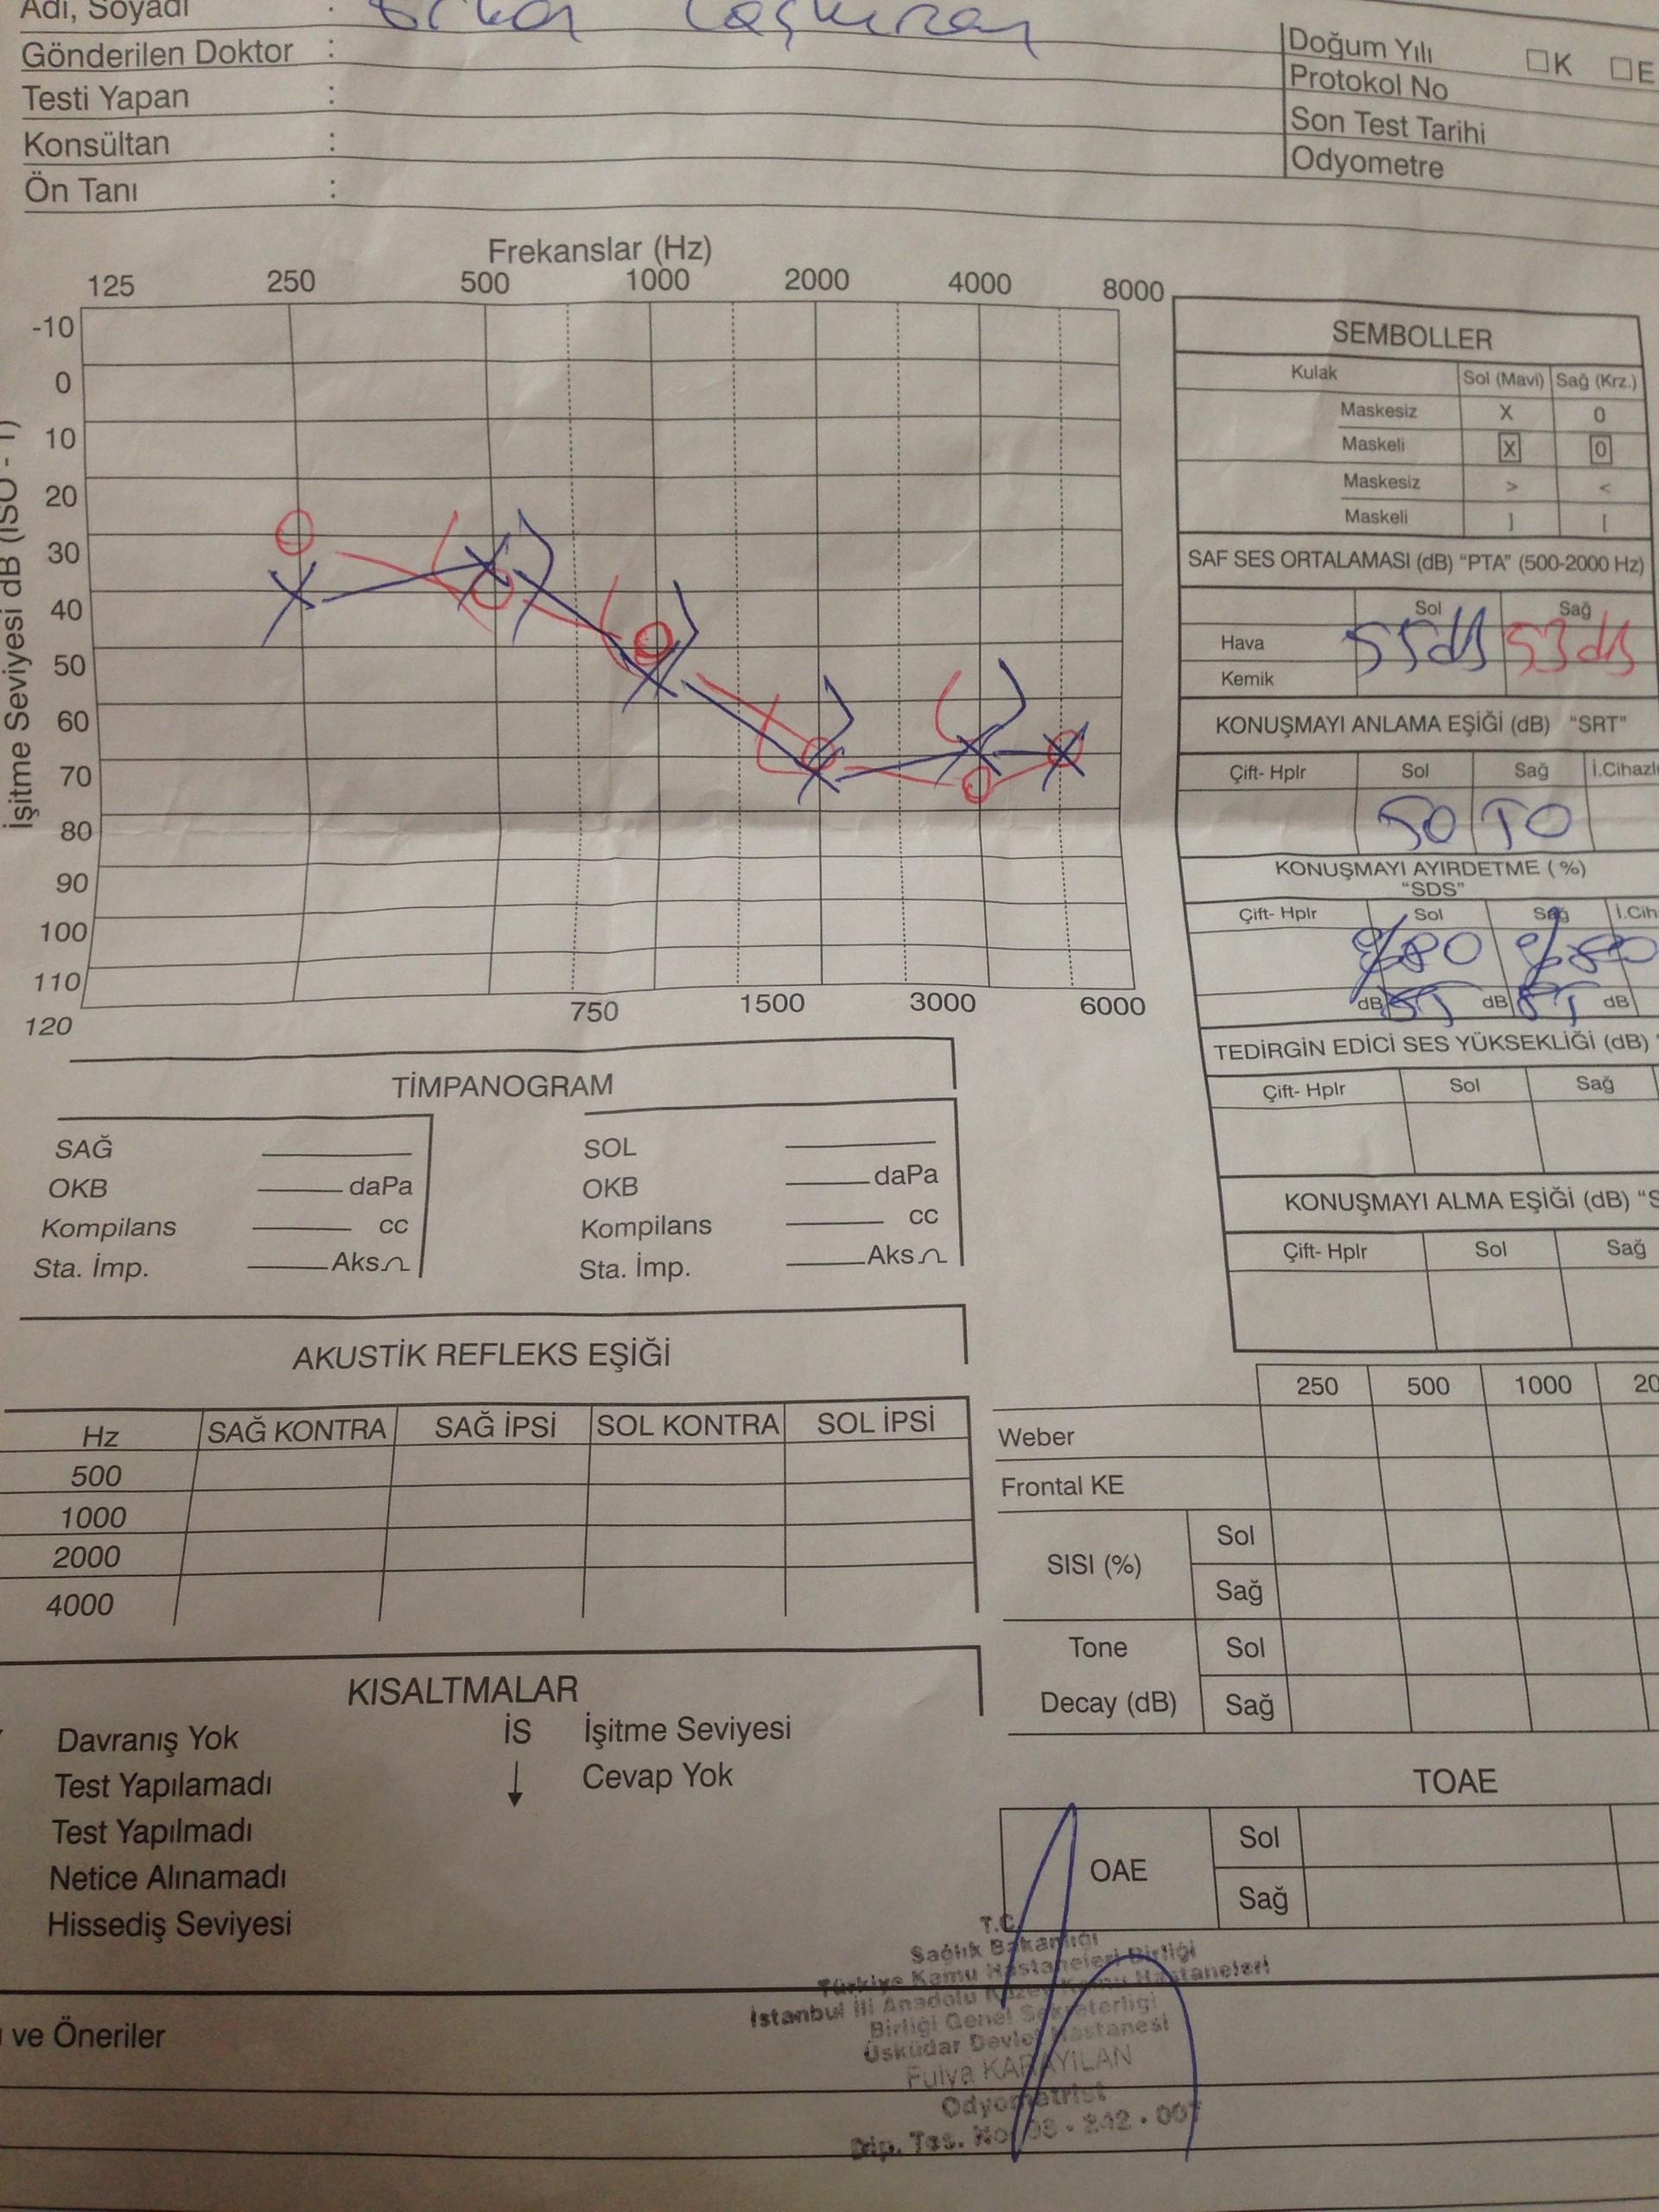 RVjV66 - ��itme testinden �z�r oran� hesaplanmas�